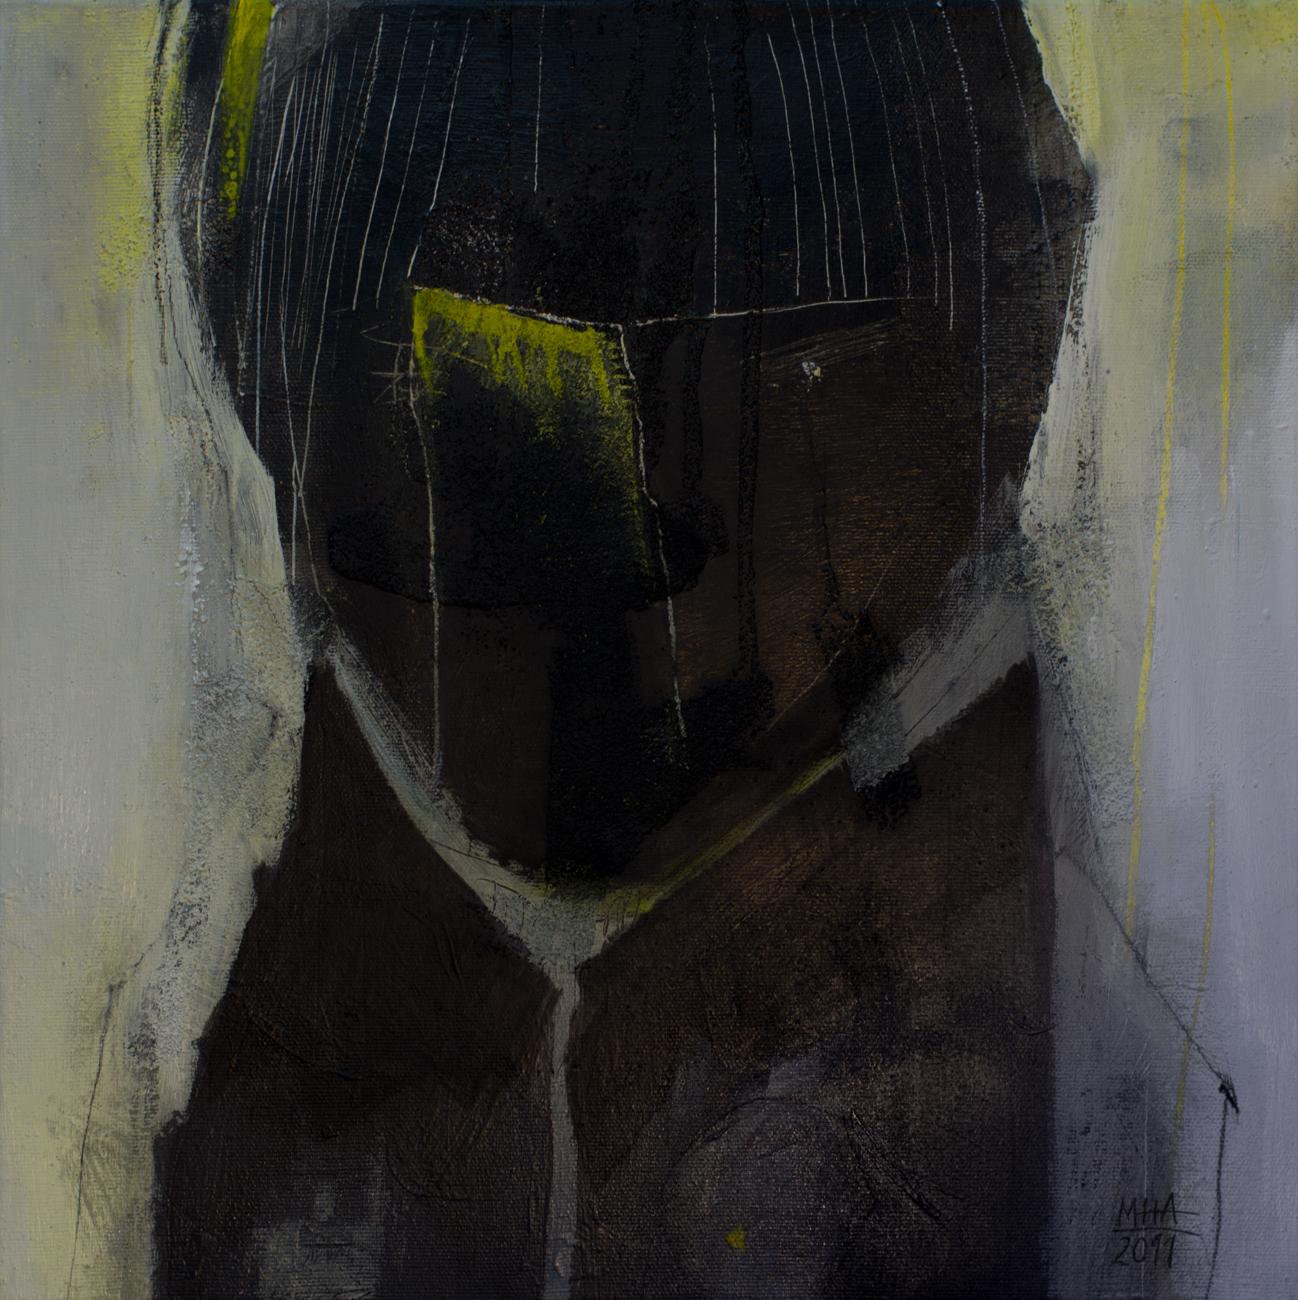 Kopf Nr. 5  ,  2011, Acryl auf Leinwand – Mischtechnik , 40x40 cm